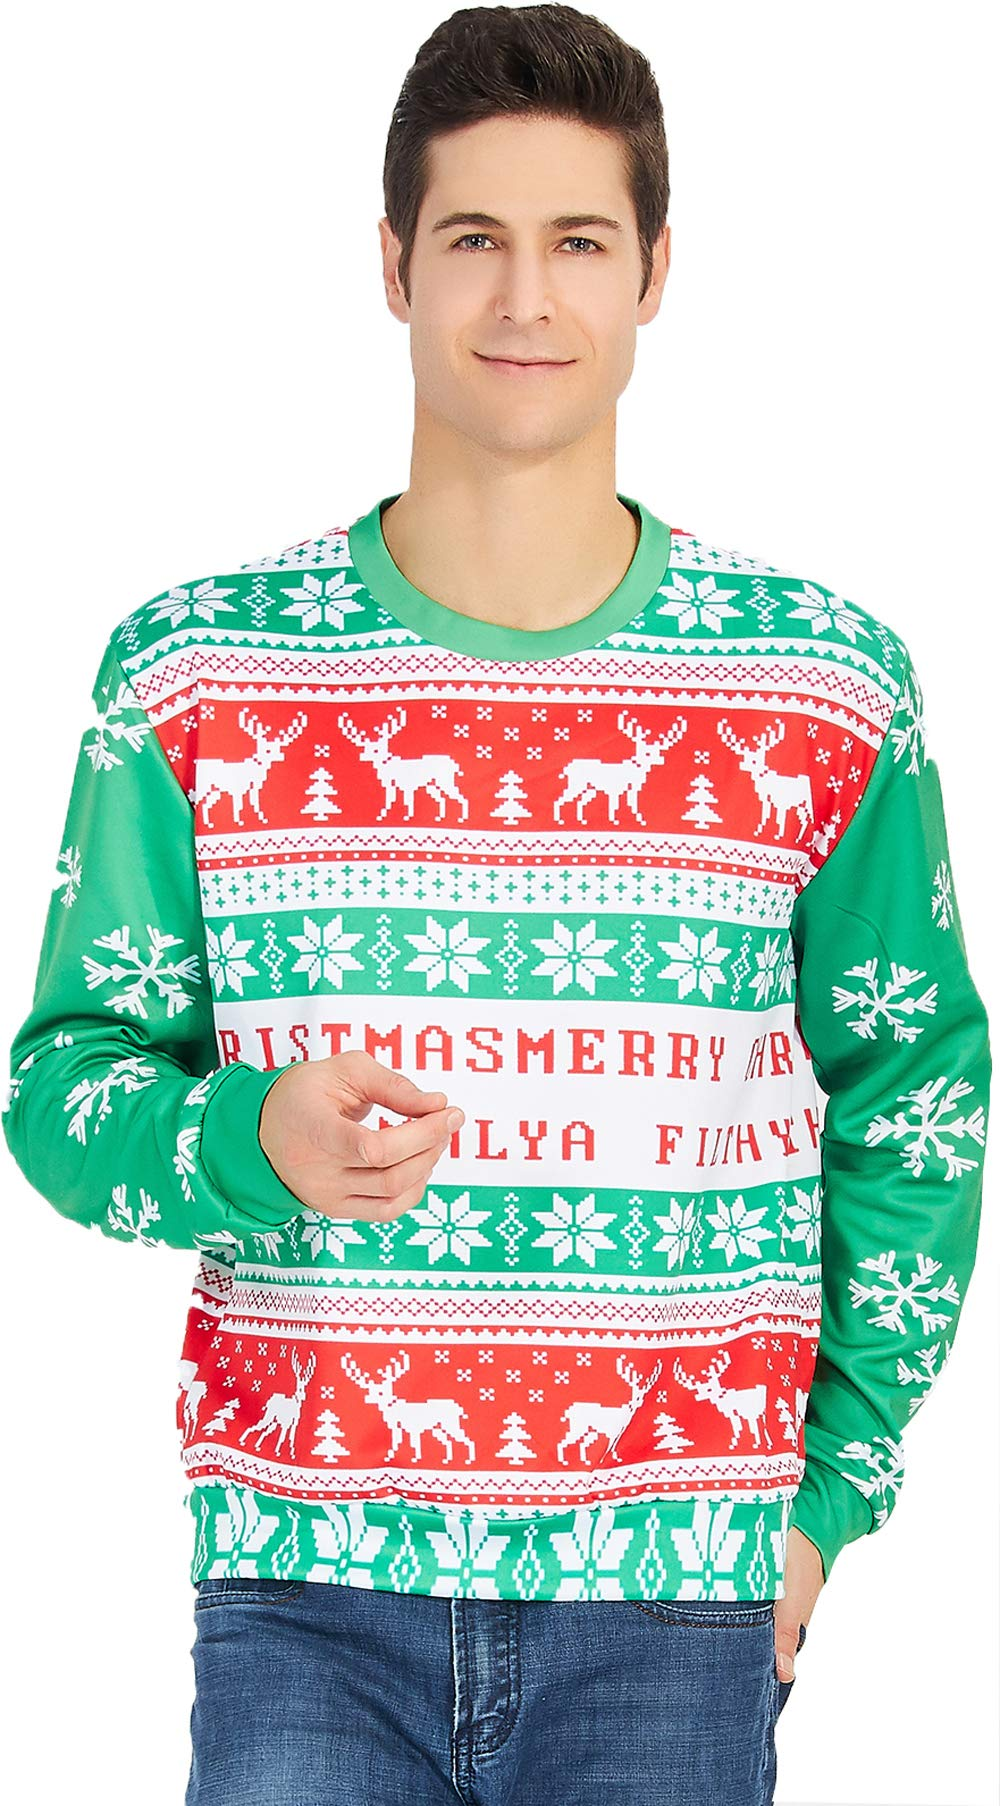 Leapparel Unisex Christmas Crewneck Sweatshirt